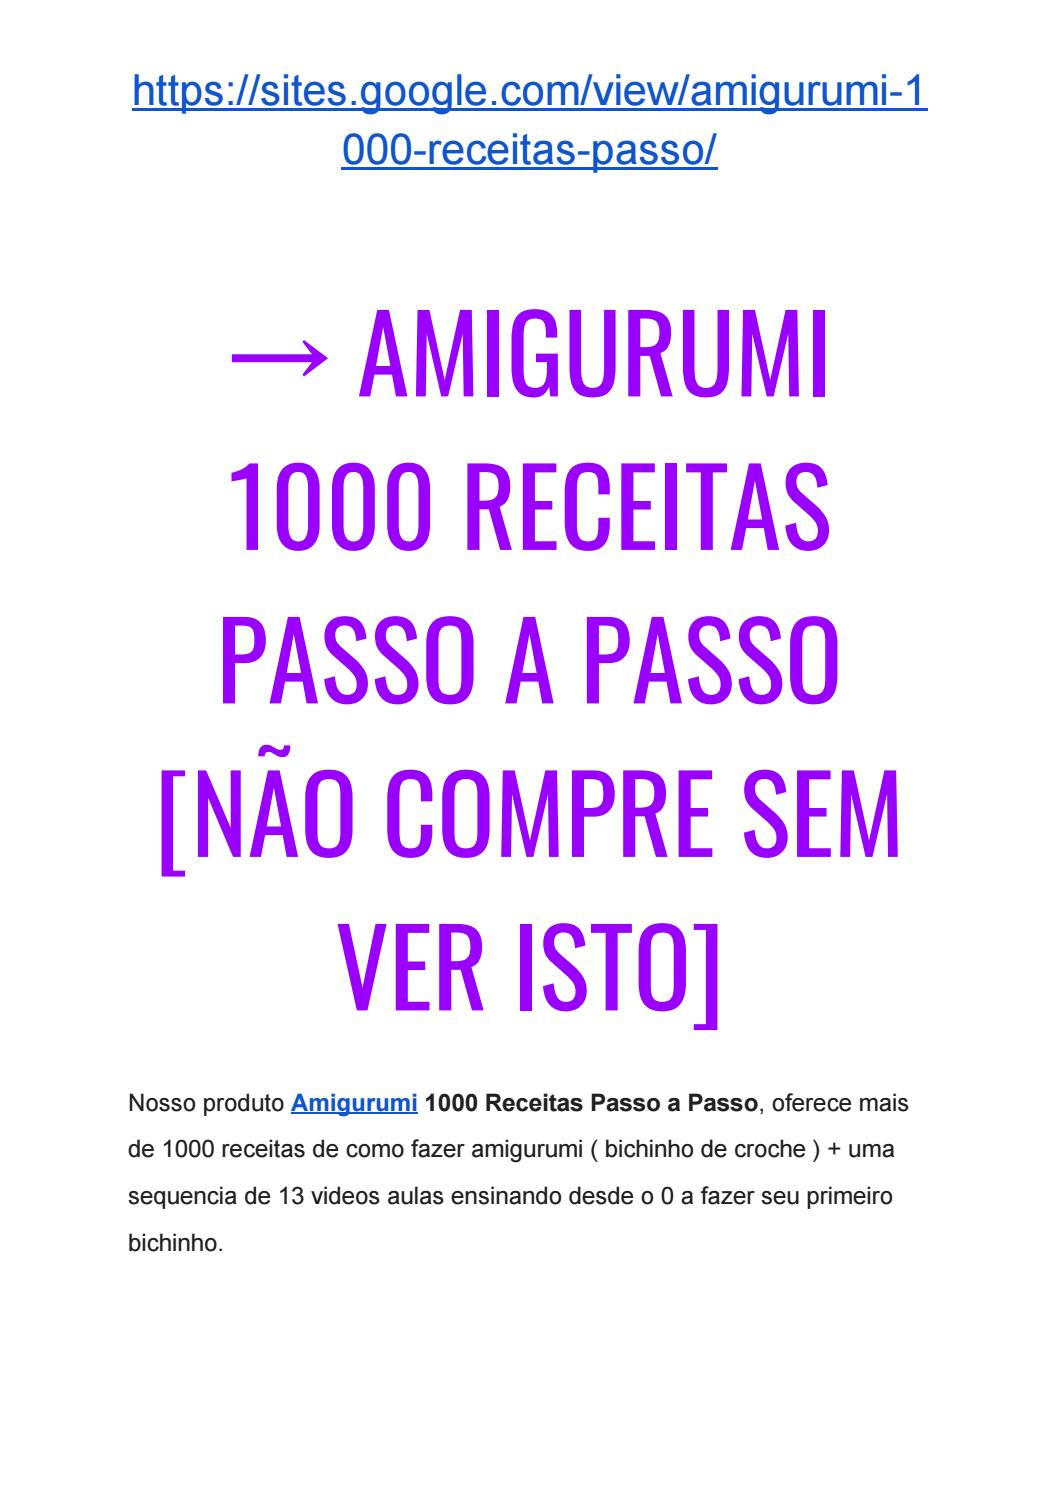 Crochê: Cavalos de brinquedos – Hipismo&Co   1499x1060